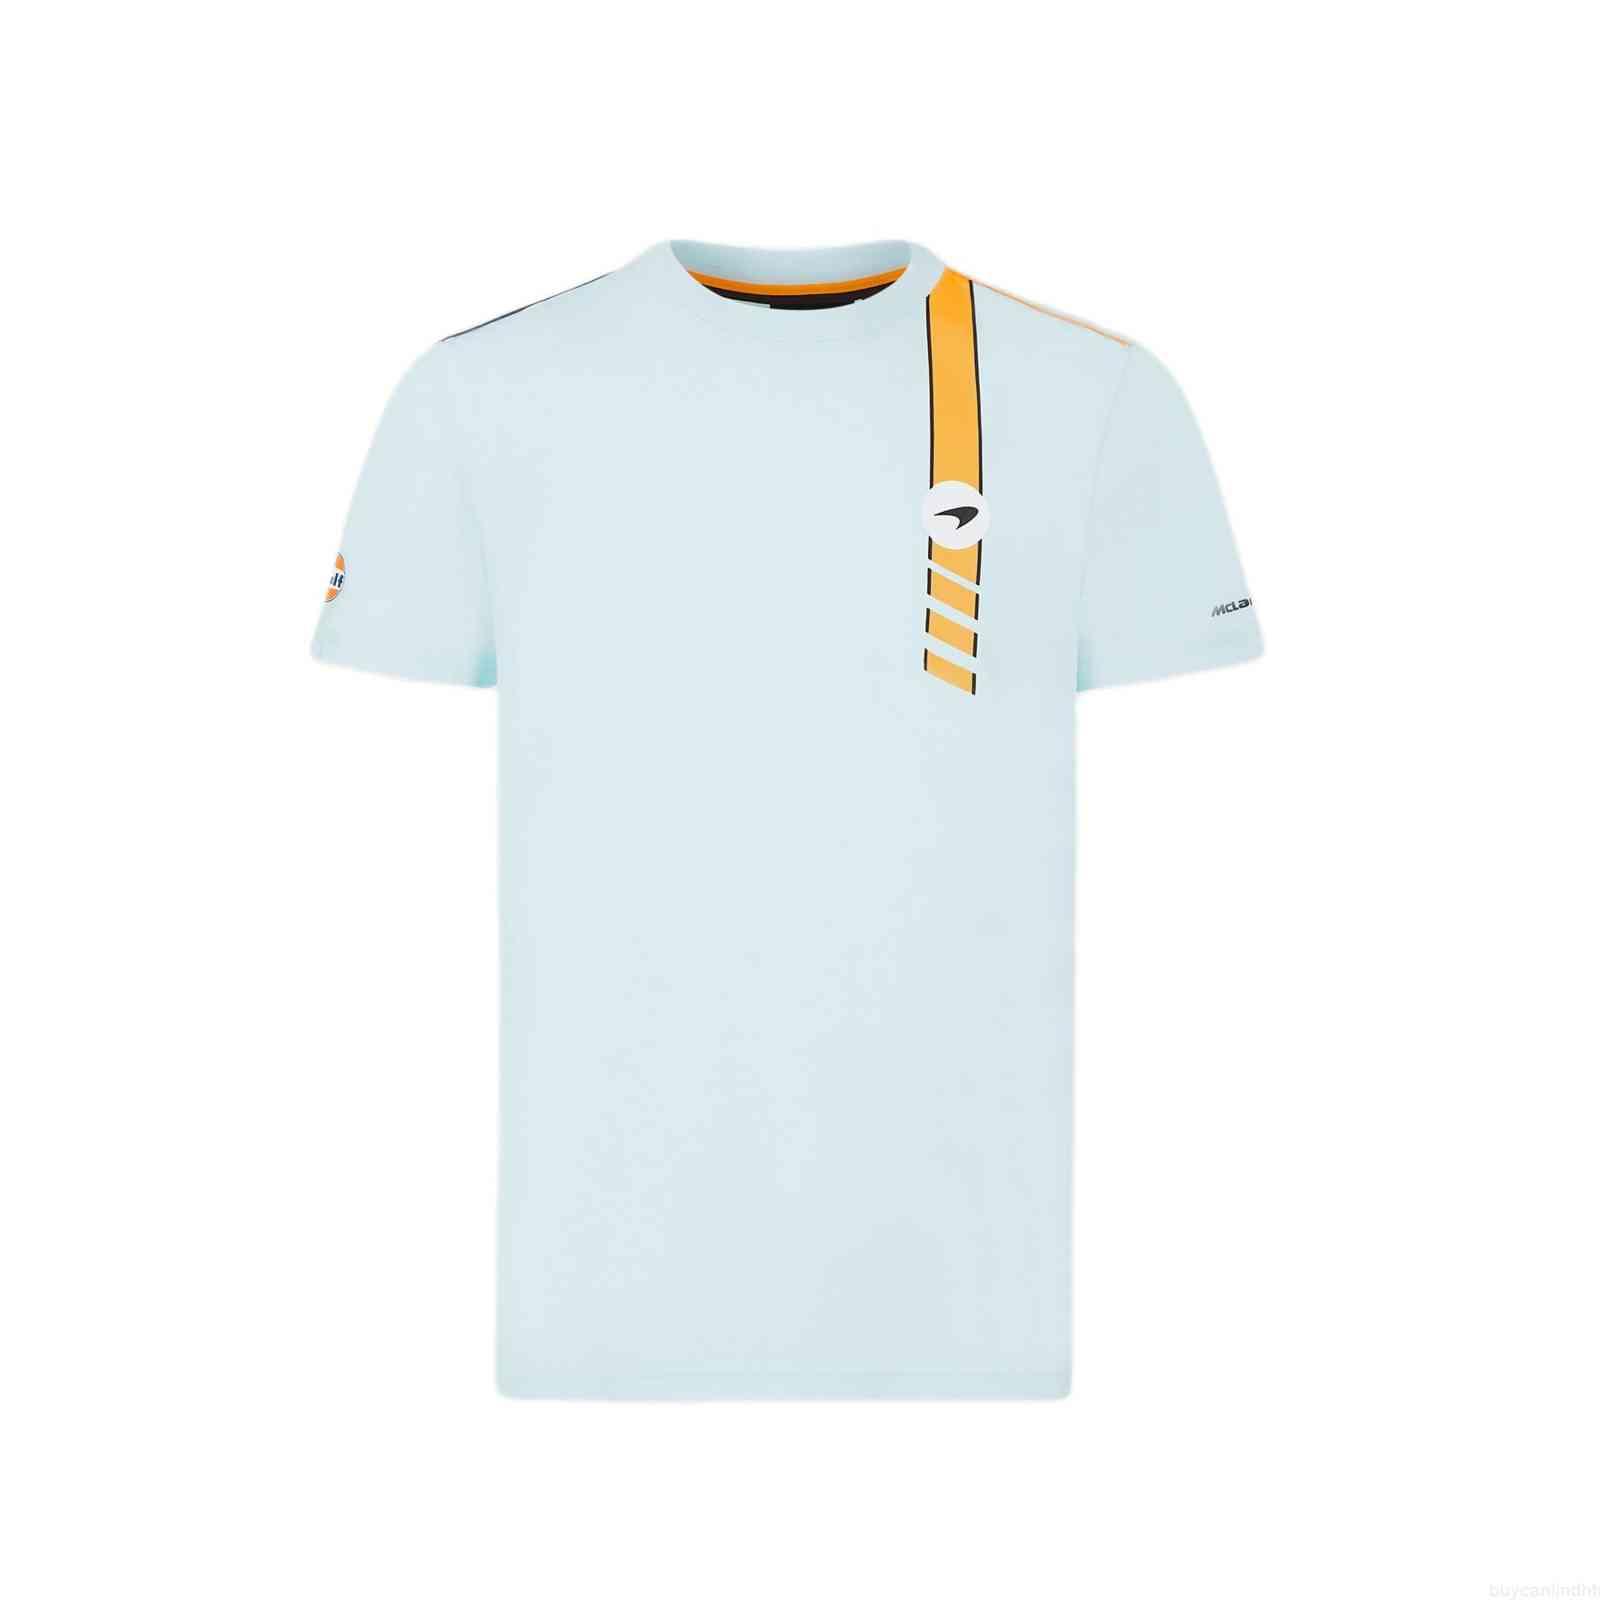 2021 F1 MclarenTeam Jersey T shirt Formula One Racing Suit Summer Fashion Tshirts Harajuku Men's and Women's Short Sleeve Sports Tees T-shirt